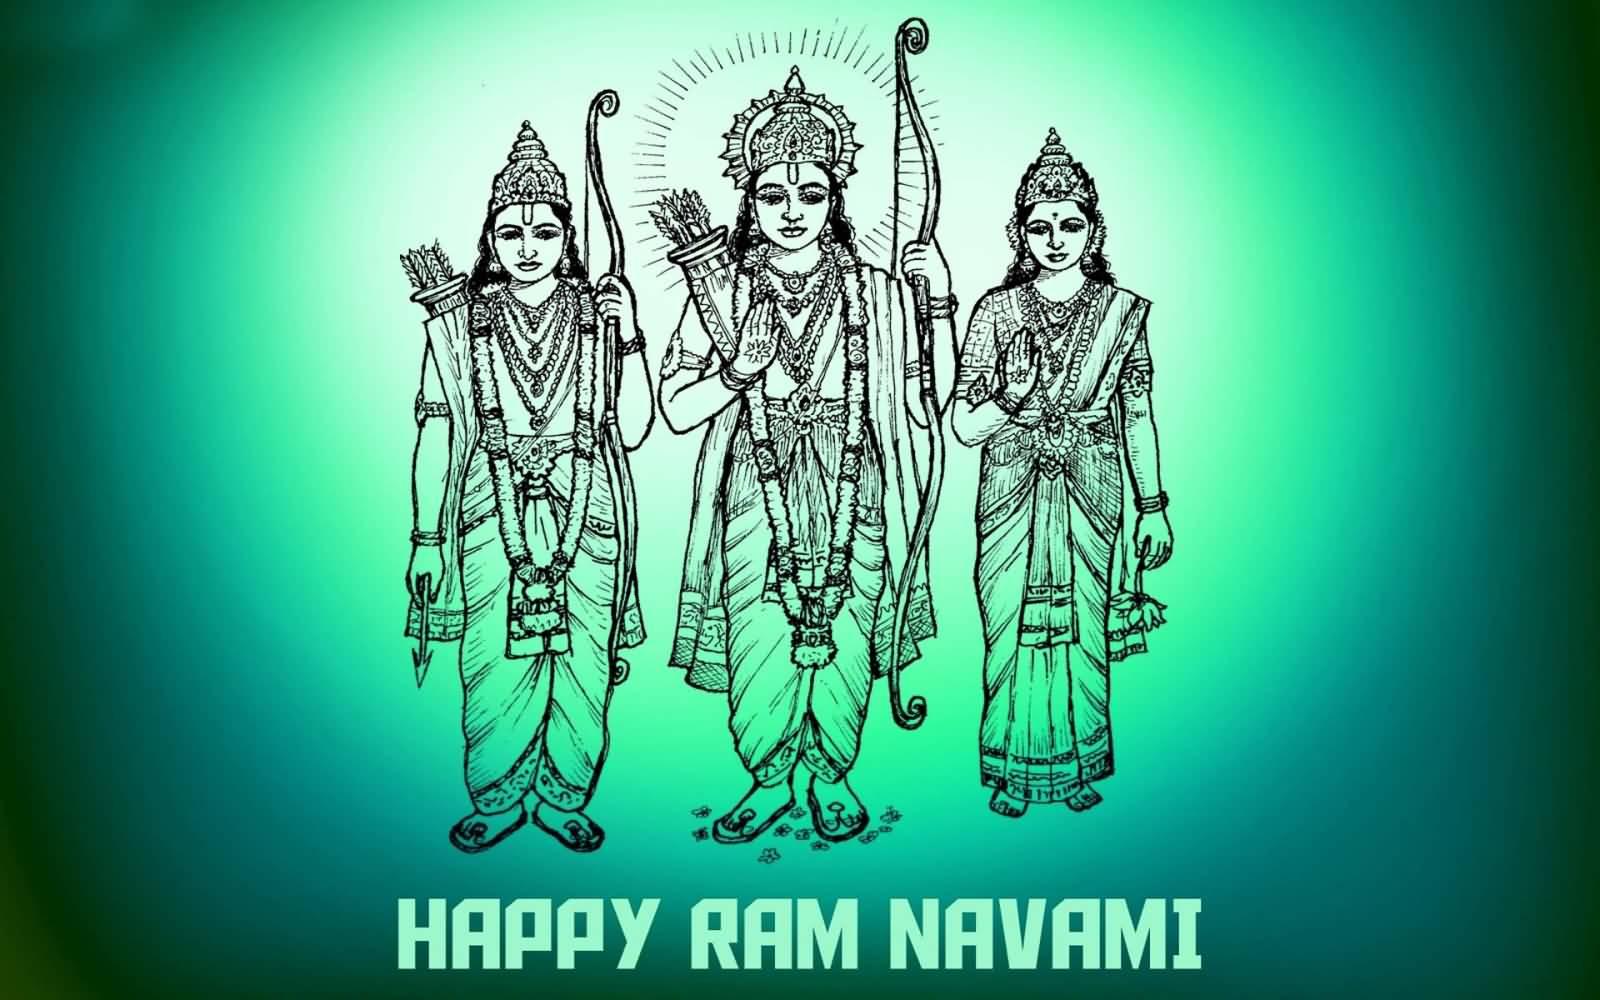 Ram Navami 2017 Photos